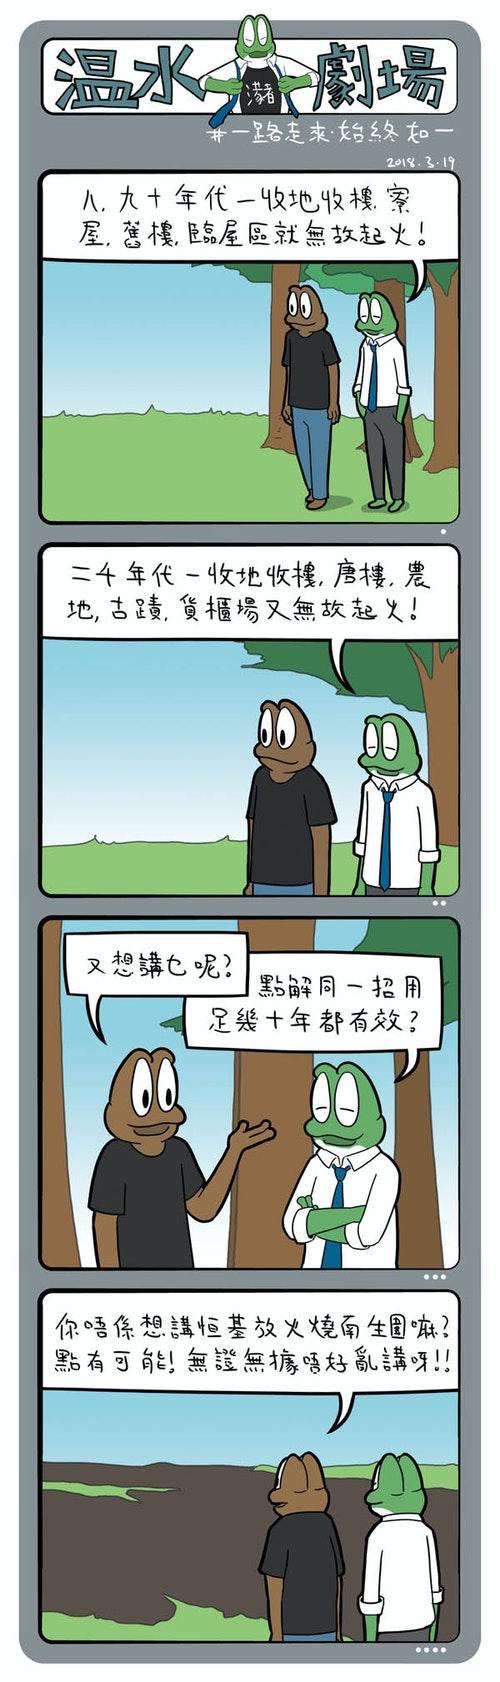 frog_news_lens_143_544